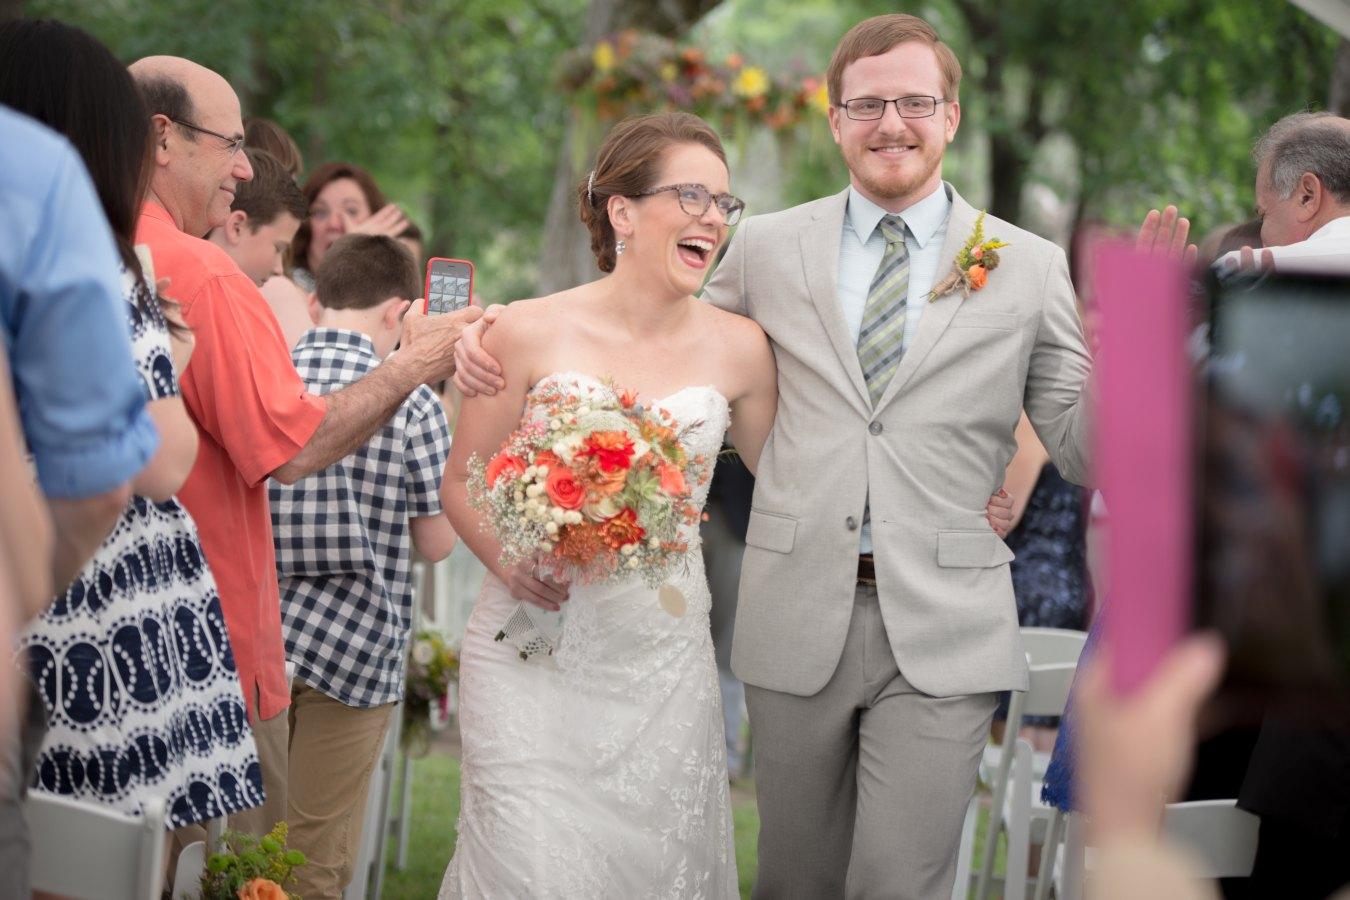 HighDot-Studios-Wedding-Cedar-Bend-Event-Center -Austin-Kim and Mike (34)